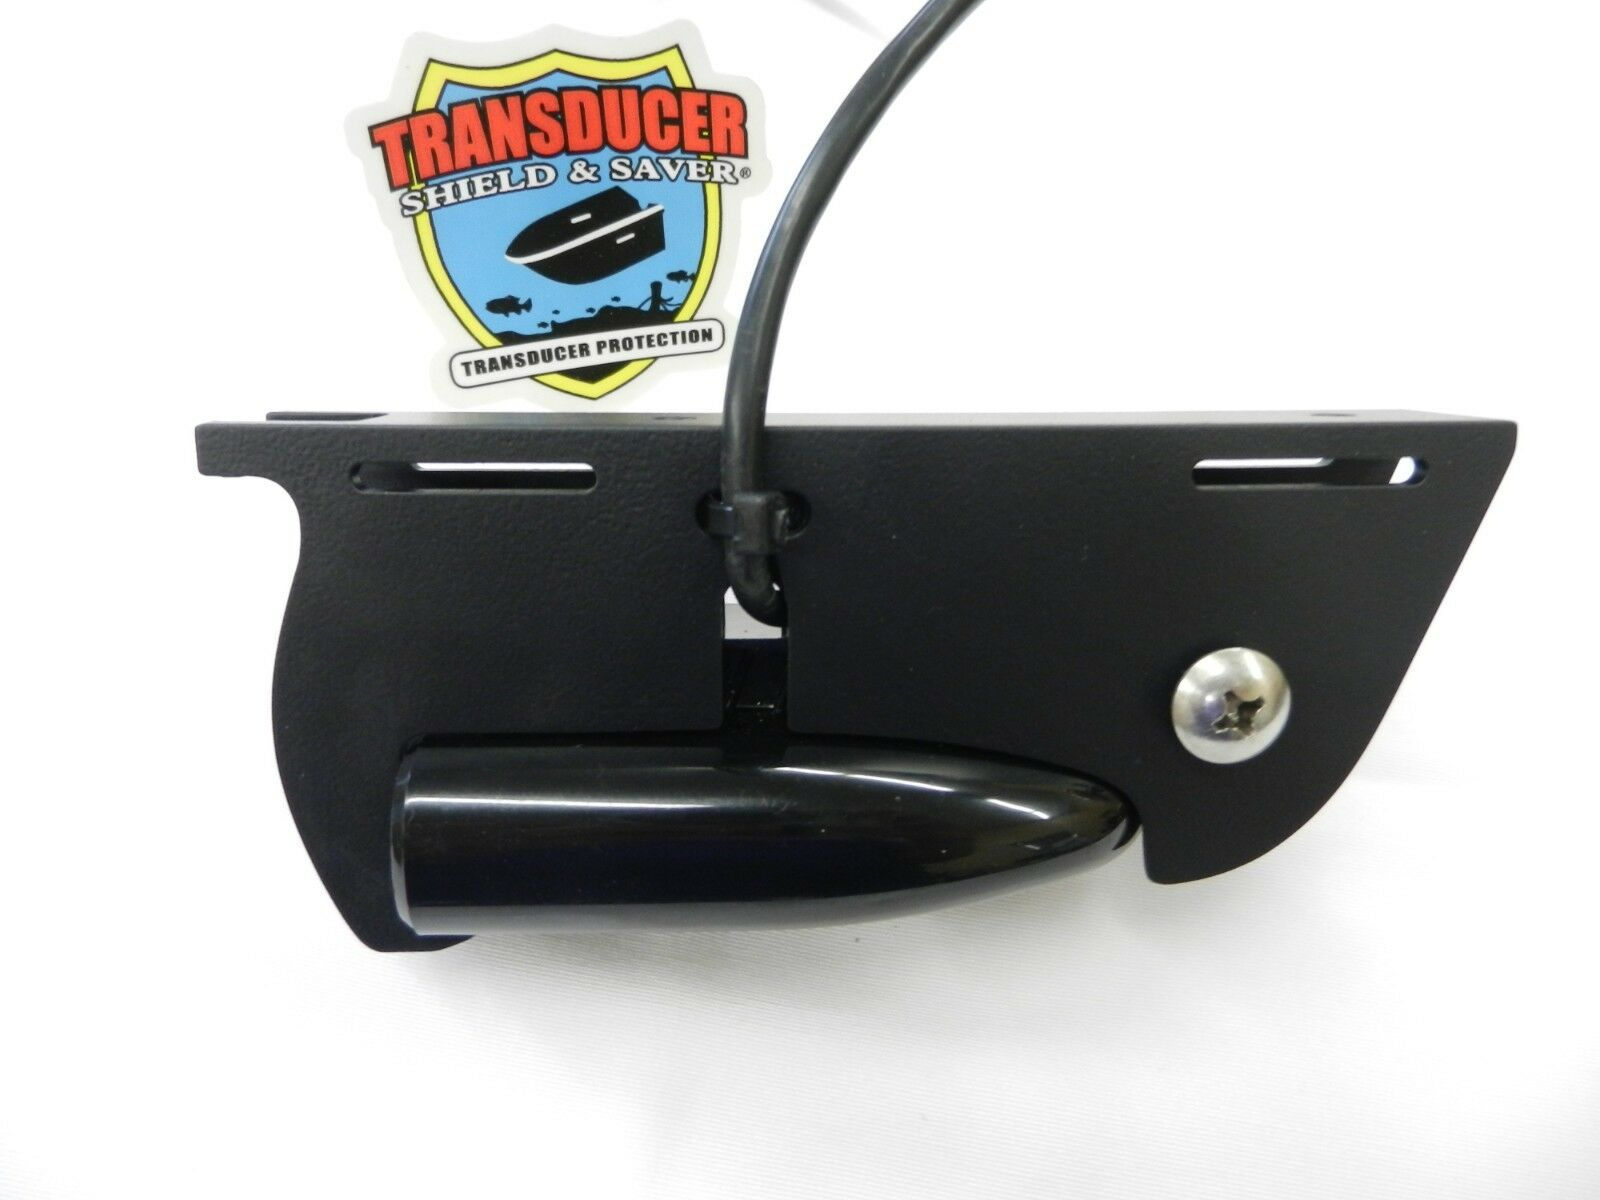 TRANSDUCER SHIELD & SAVER + STRAPS for LOWRANCE® HOOK2 SPLIT SHOT TRANSDUCER